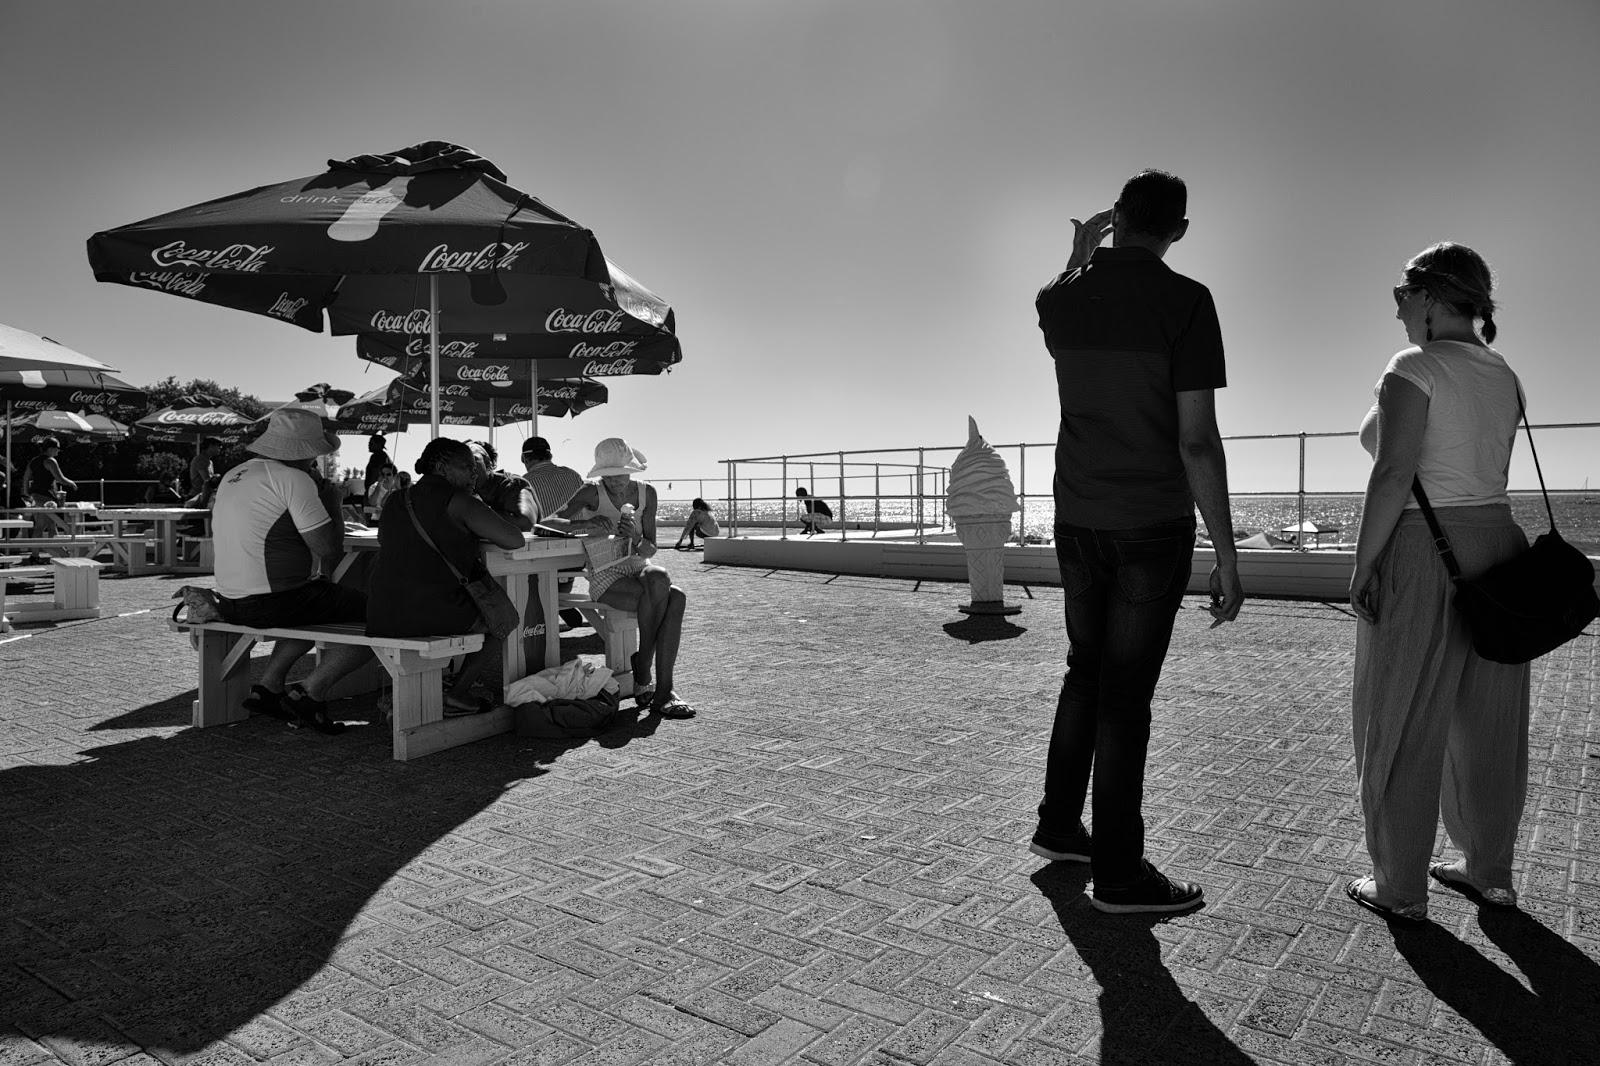 The icecream on the sepoint promenade